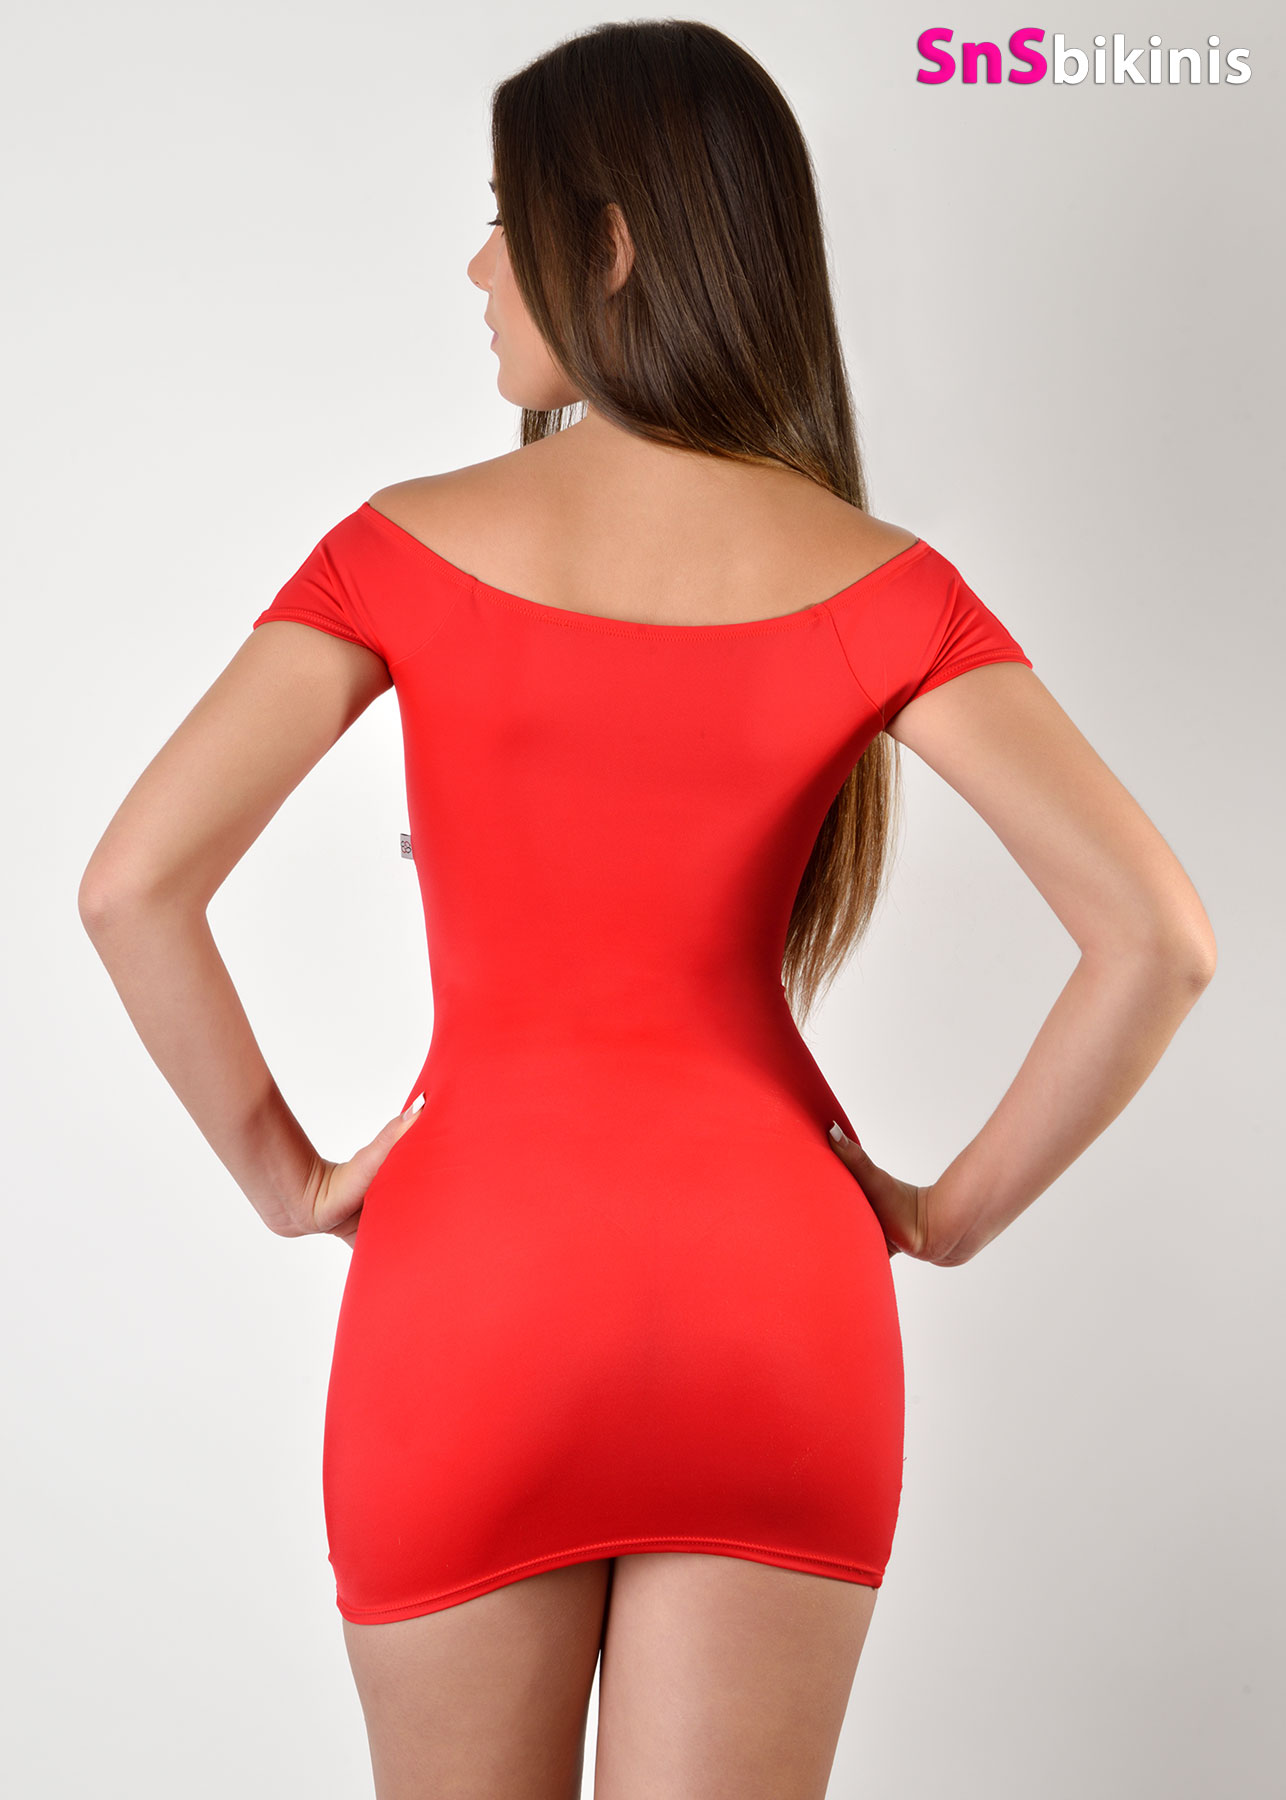 sabrina sexy mini dress shbr002 snsbikinis. Black Bedroom Furniture Sets. Home Design Ideas